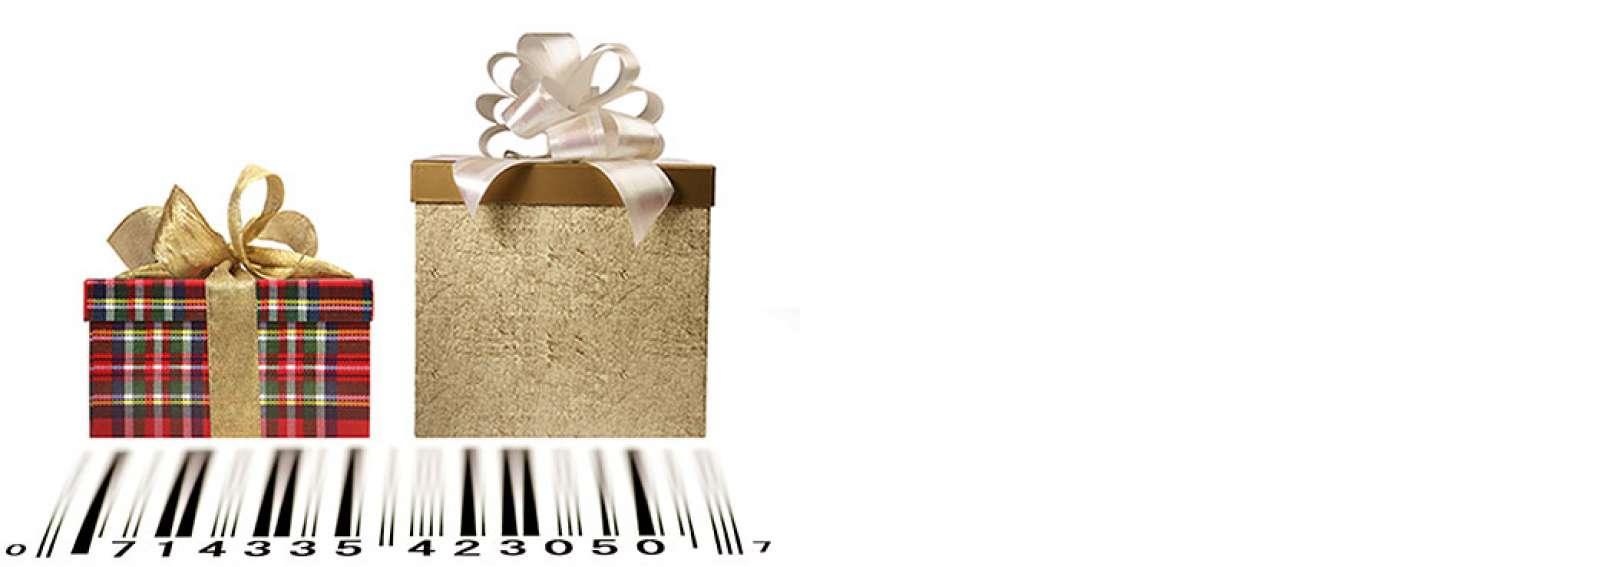 Gift Receipts